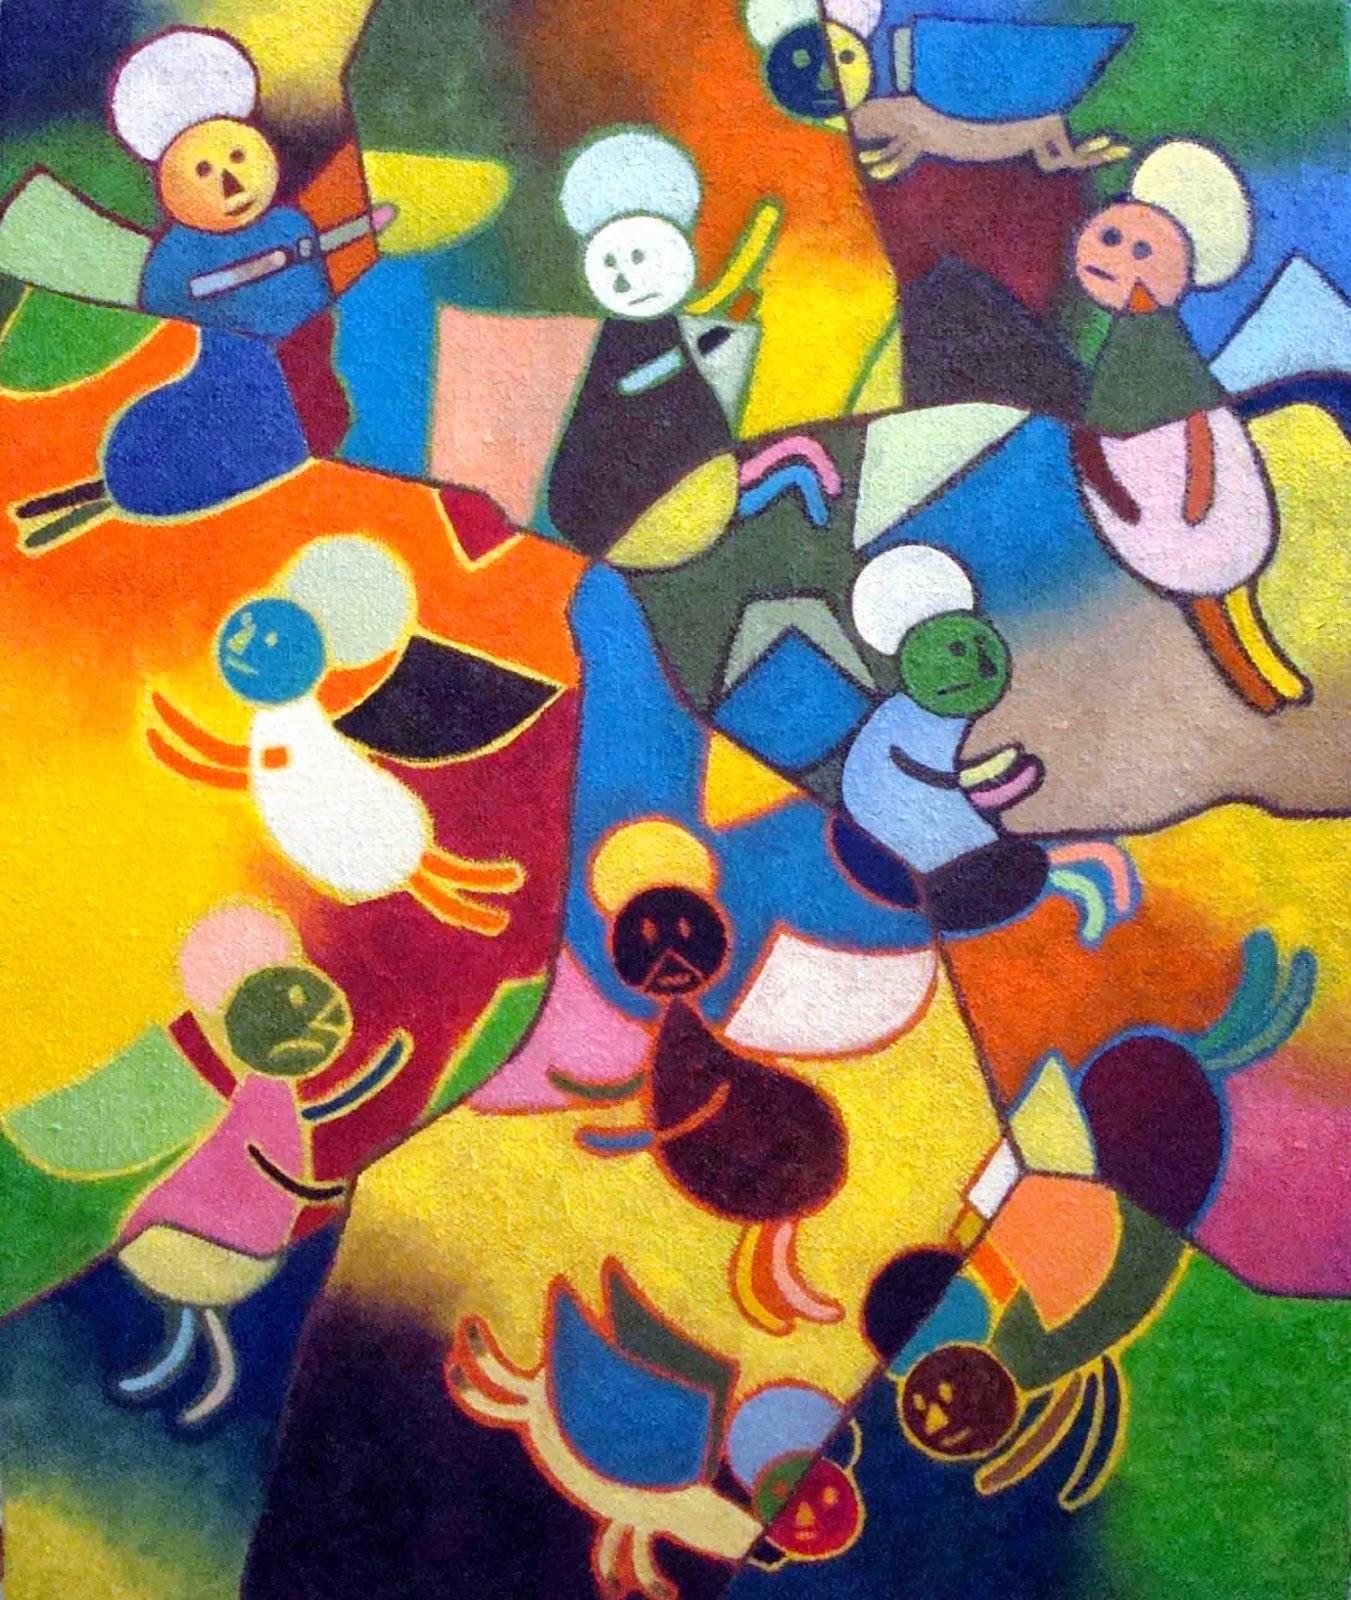 david kantorovitz art naif - outsider art magazine gricha rosov